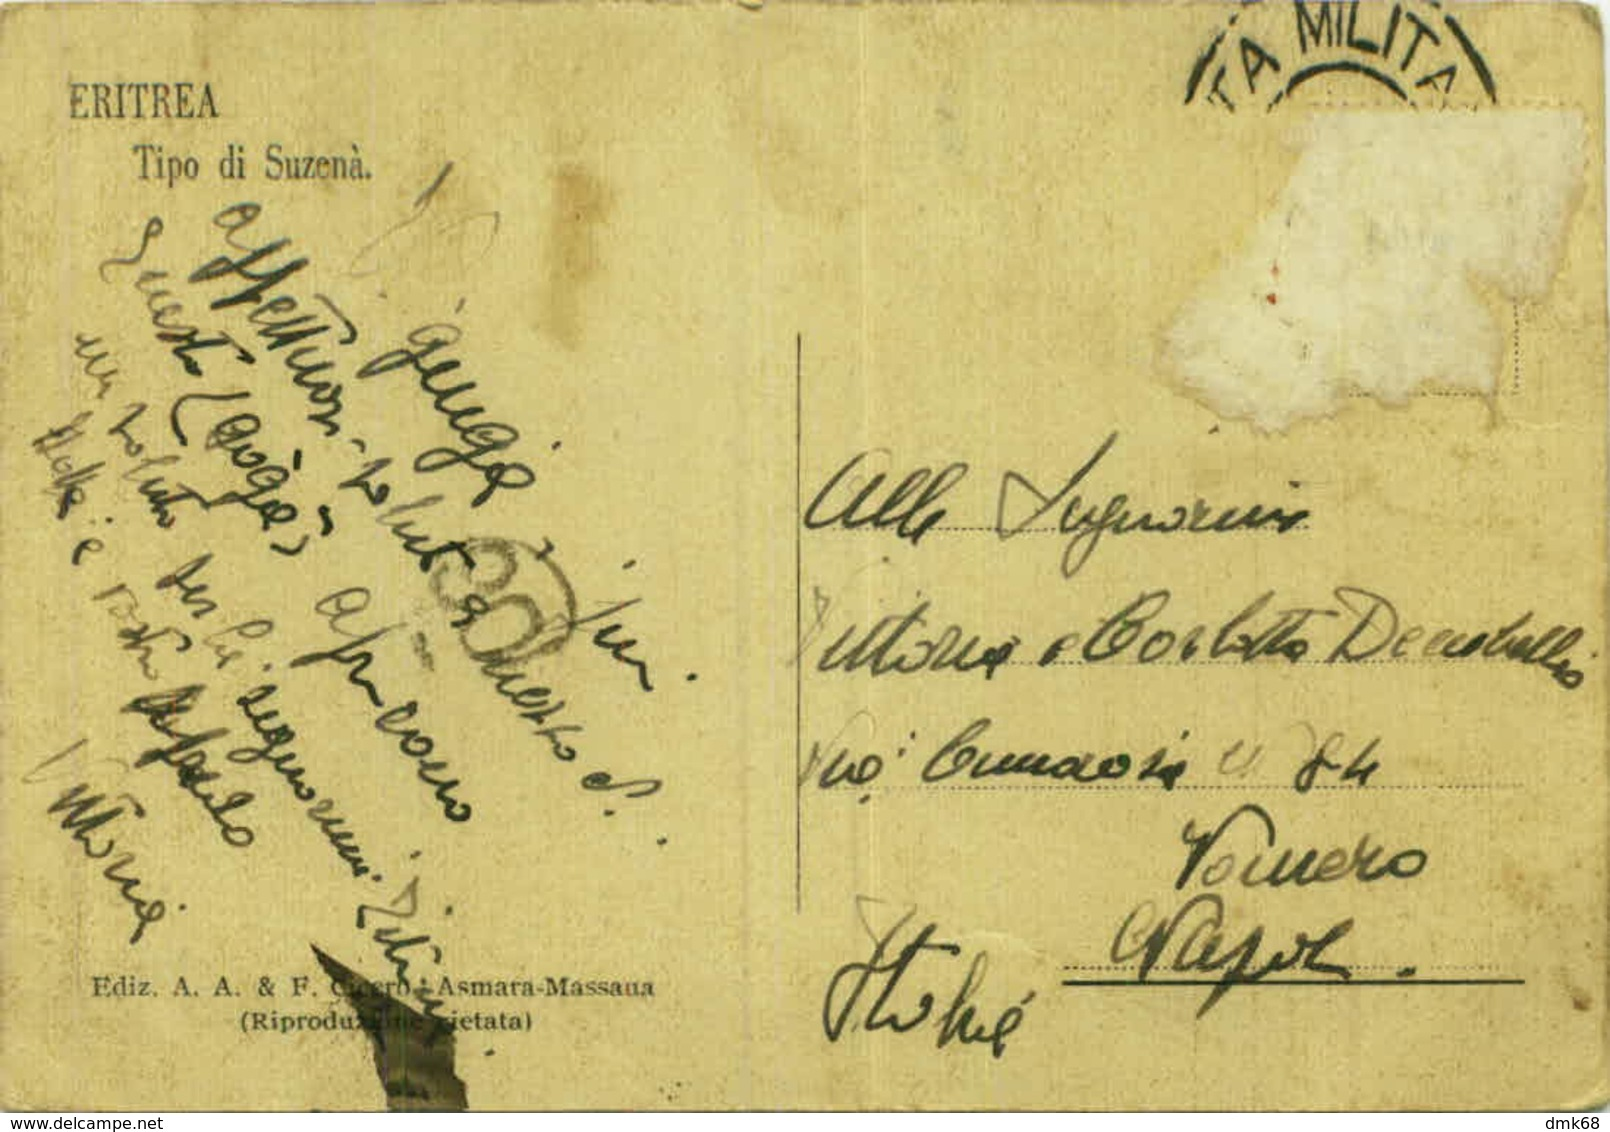 AFRICA - ERITREA - TYPE OF SUZEMA -  BARE-CHESTED MAN - EDIT- A.A. & F. CICERO - 1920s (BG3898) - Erythrée